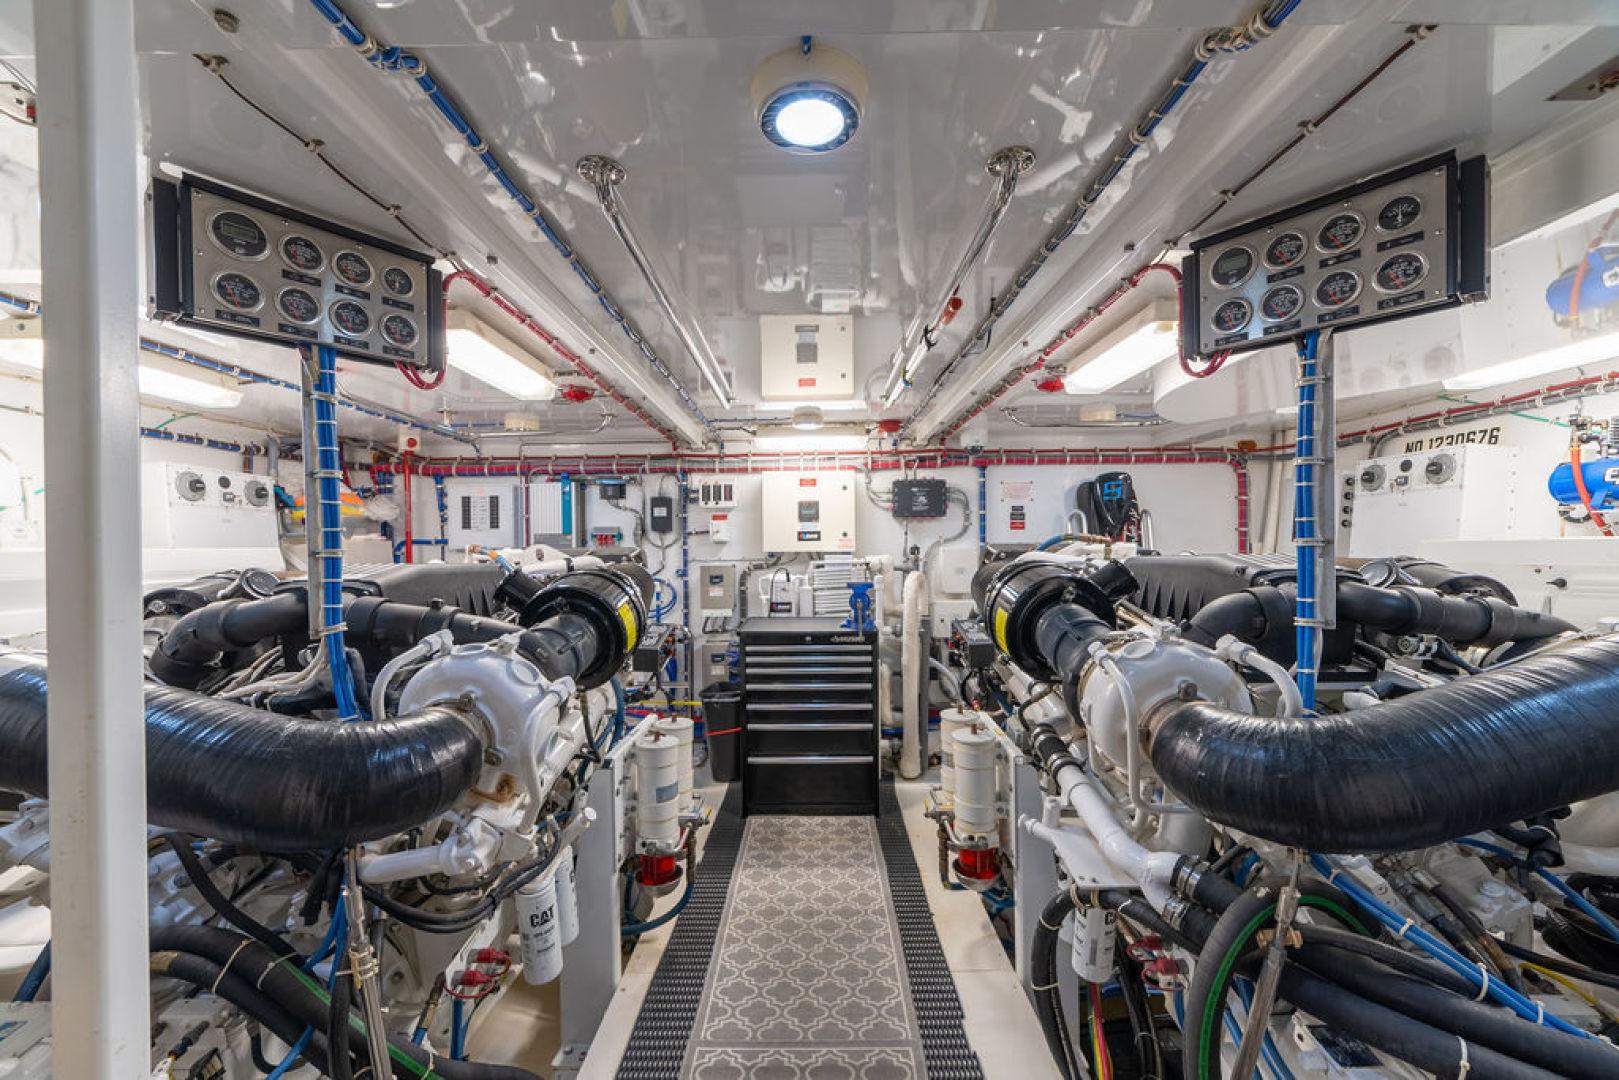 Hatteras-Enclosed Flybridge 2005-LA MER Fort Lauderdale-Florida-United States-Engine Room-1510605 | Thumbnail